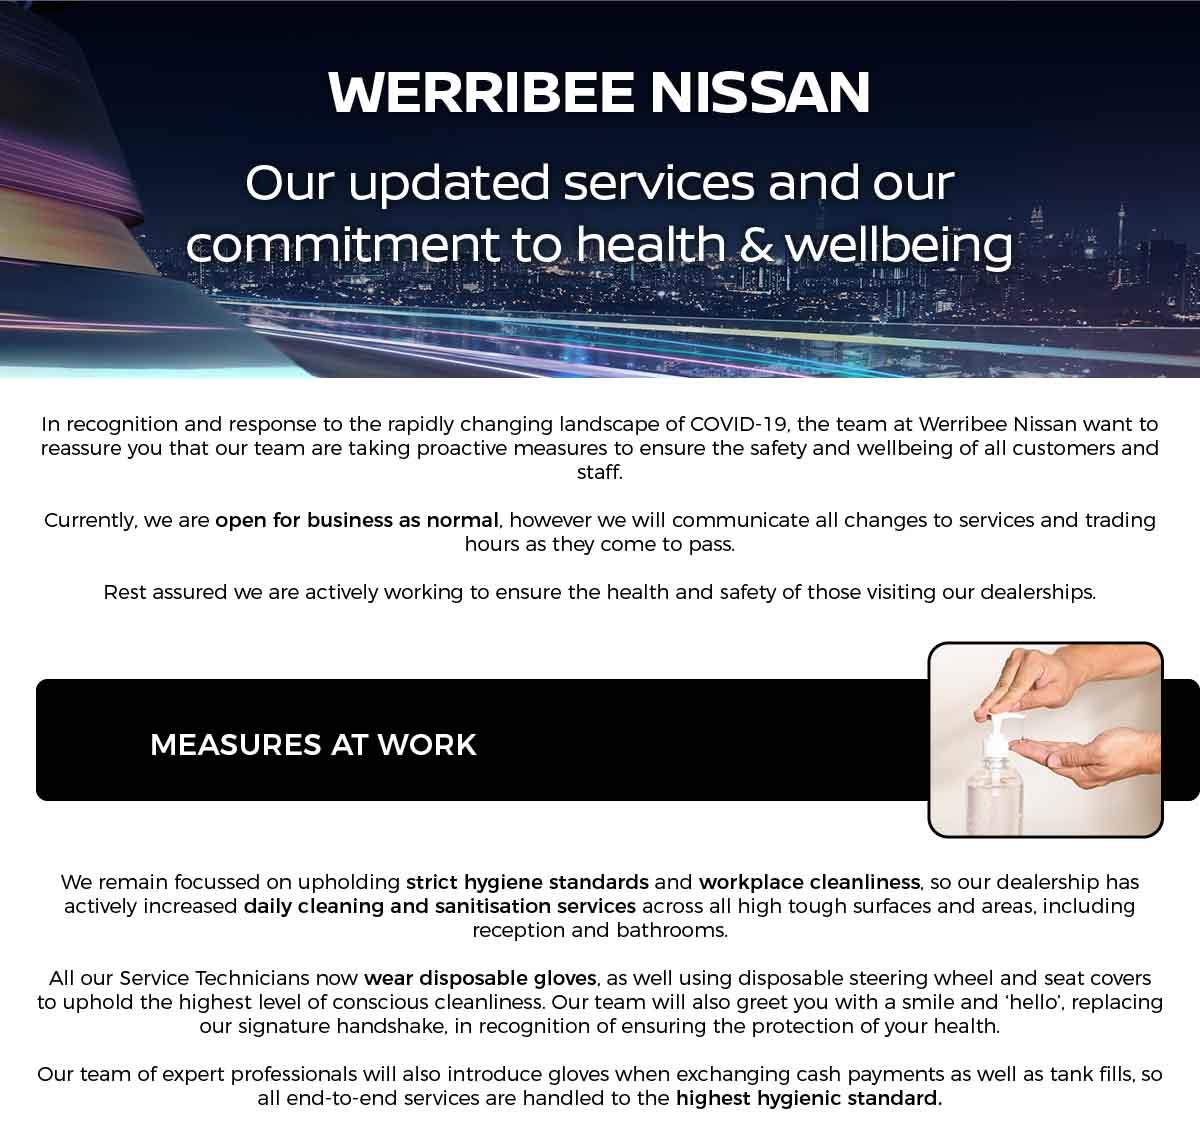 Werribee Nissan Updated Services